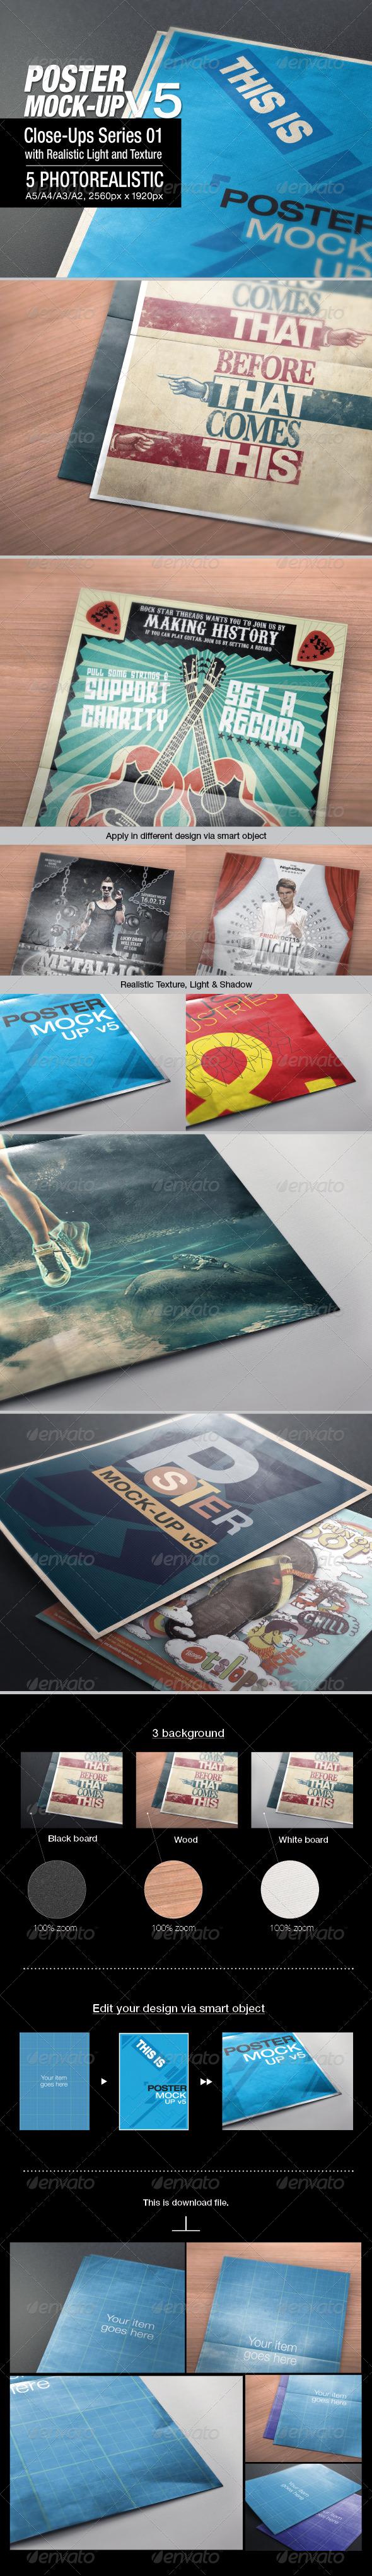 Poster Mock-up v5 - Posters Print